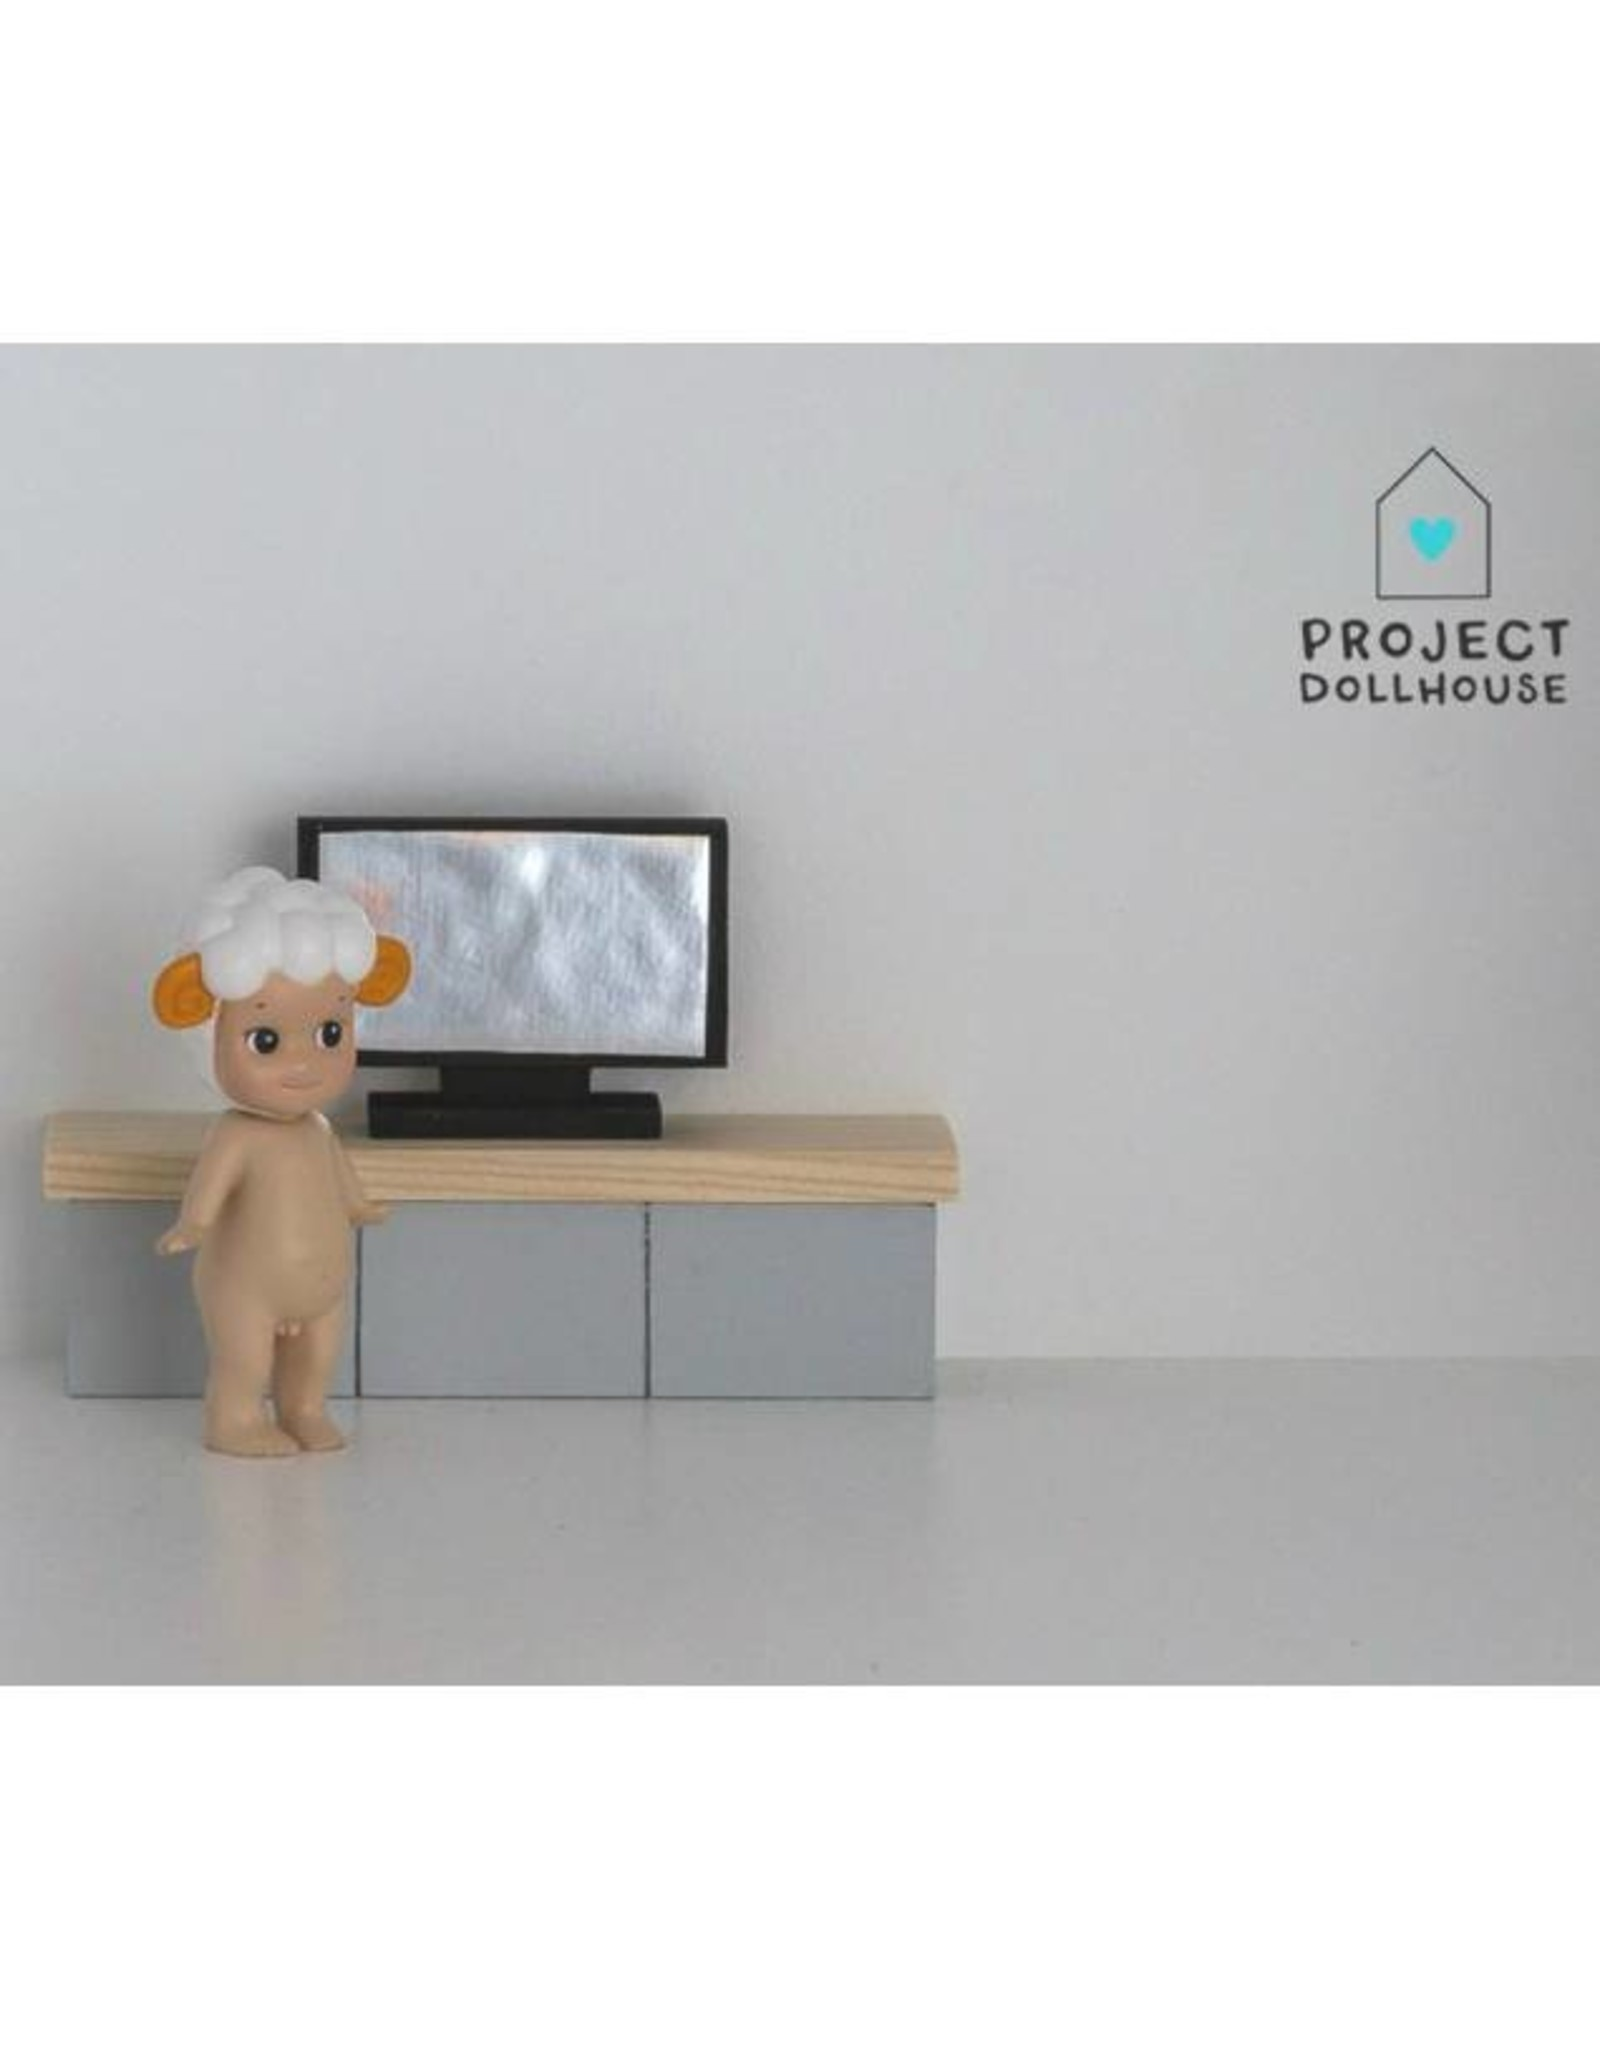 Project Dollhouse Flat Screen TV